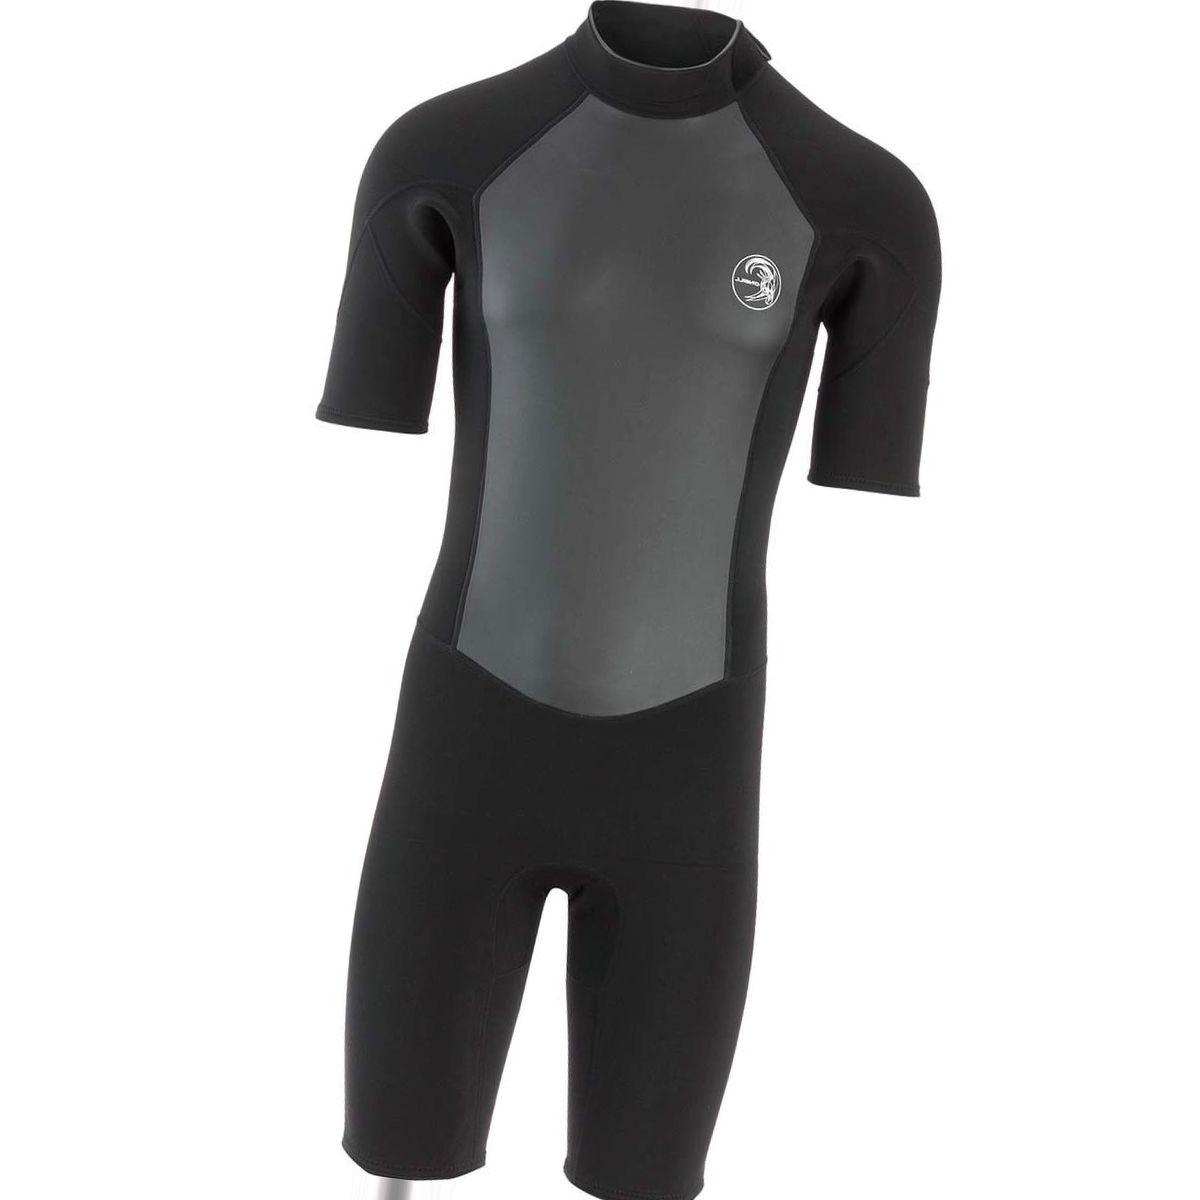 O'Neill O'riginal Short-Sleeve Spring Back-Zip Wetsuit - Men's